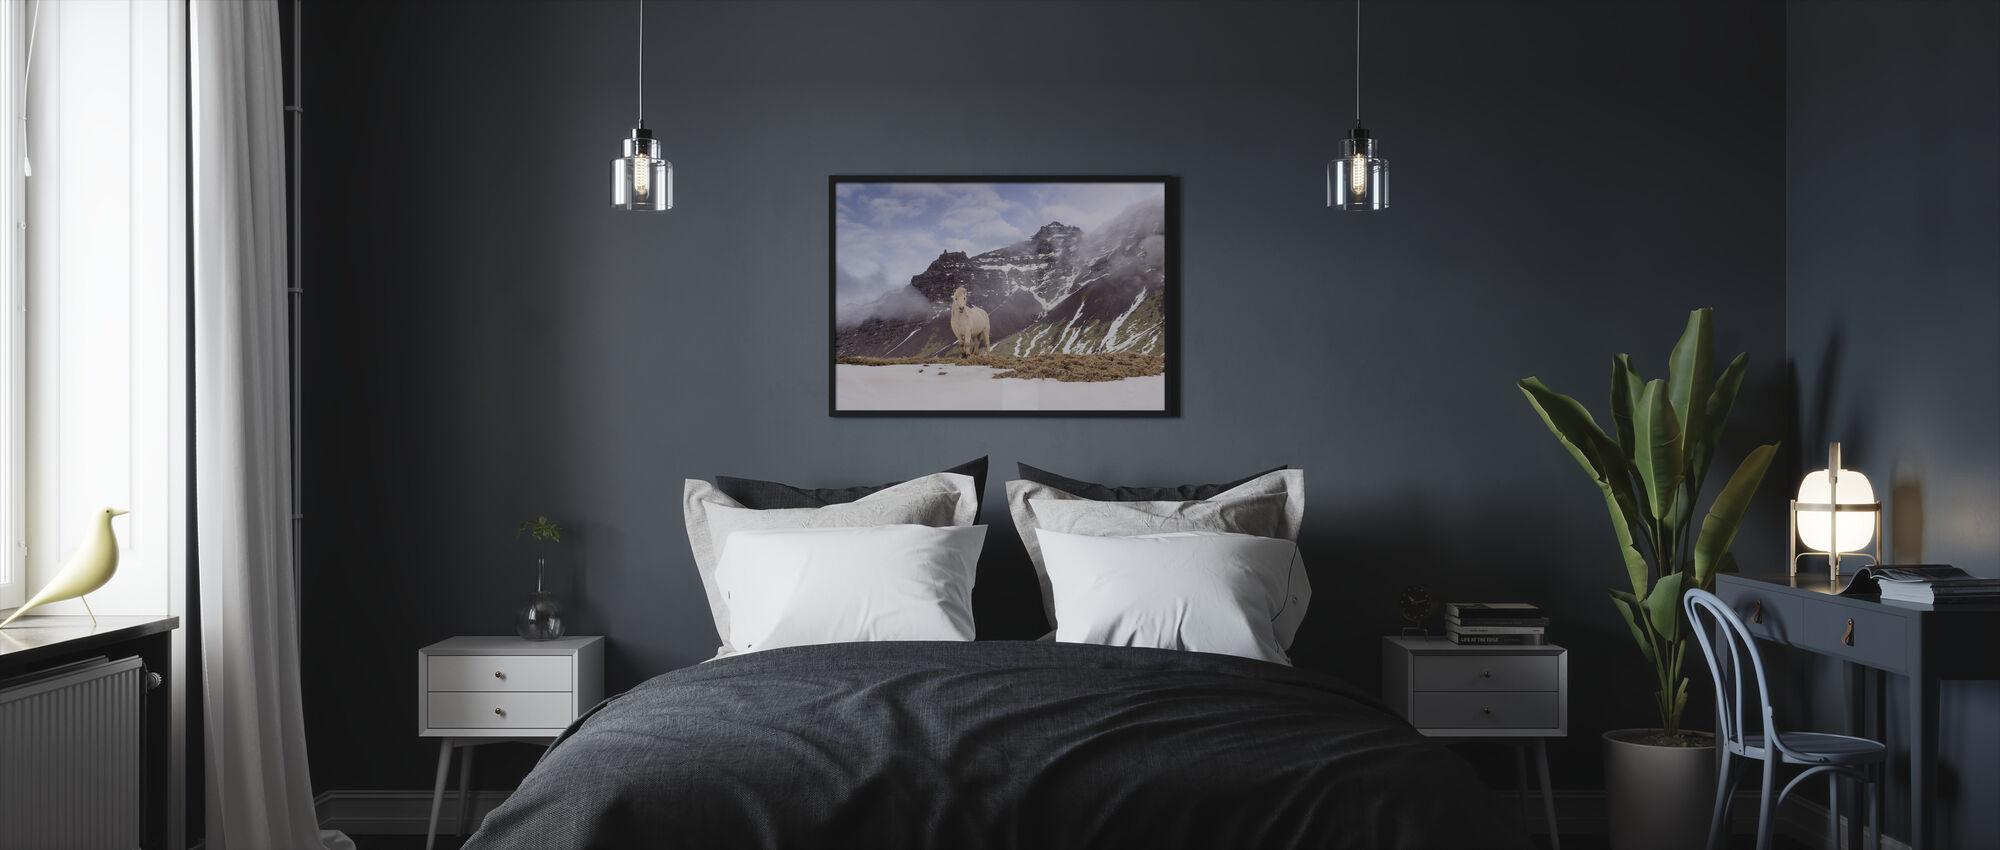 You Looking at Me - Framed print - Bedroom